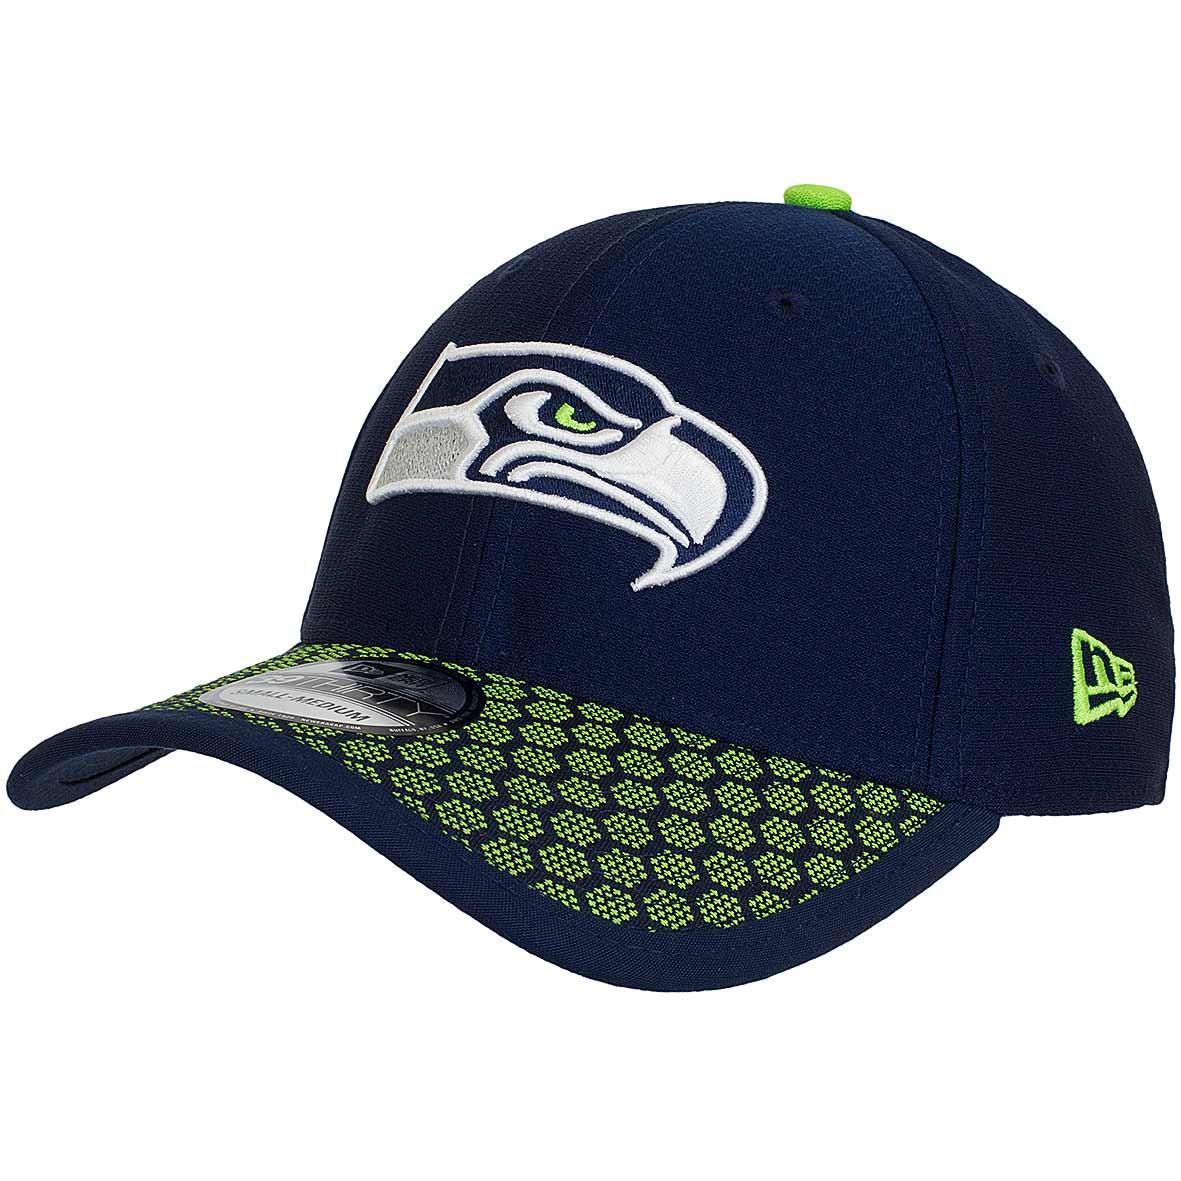 3b429cfcbd2 New Era 39Thirty Flexfit Cap OnField NFL17 Seattle Seahawks dunkelblau grün